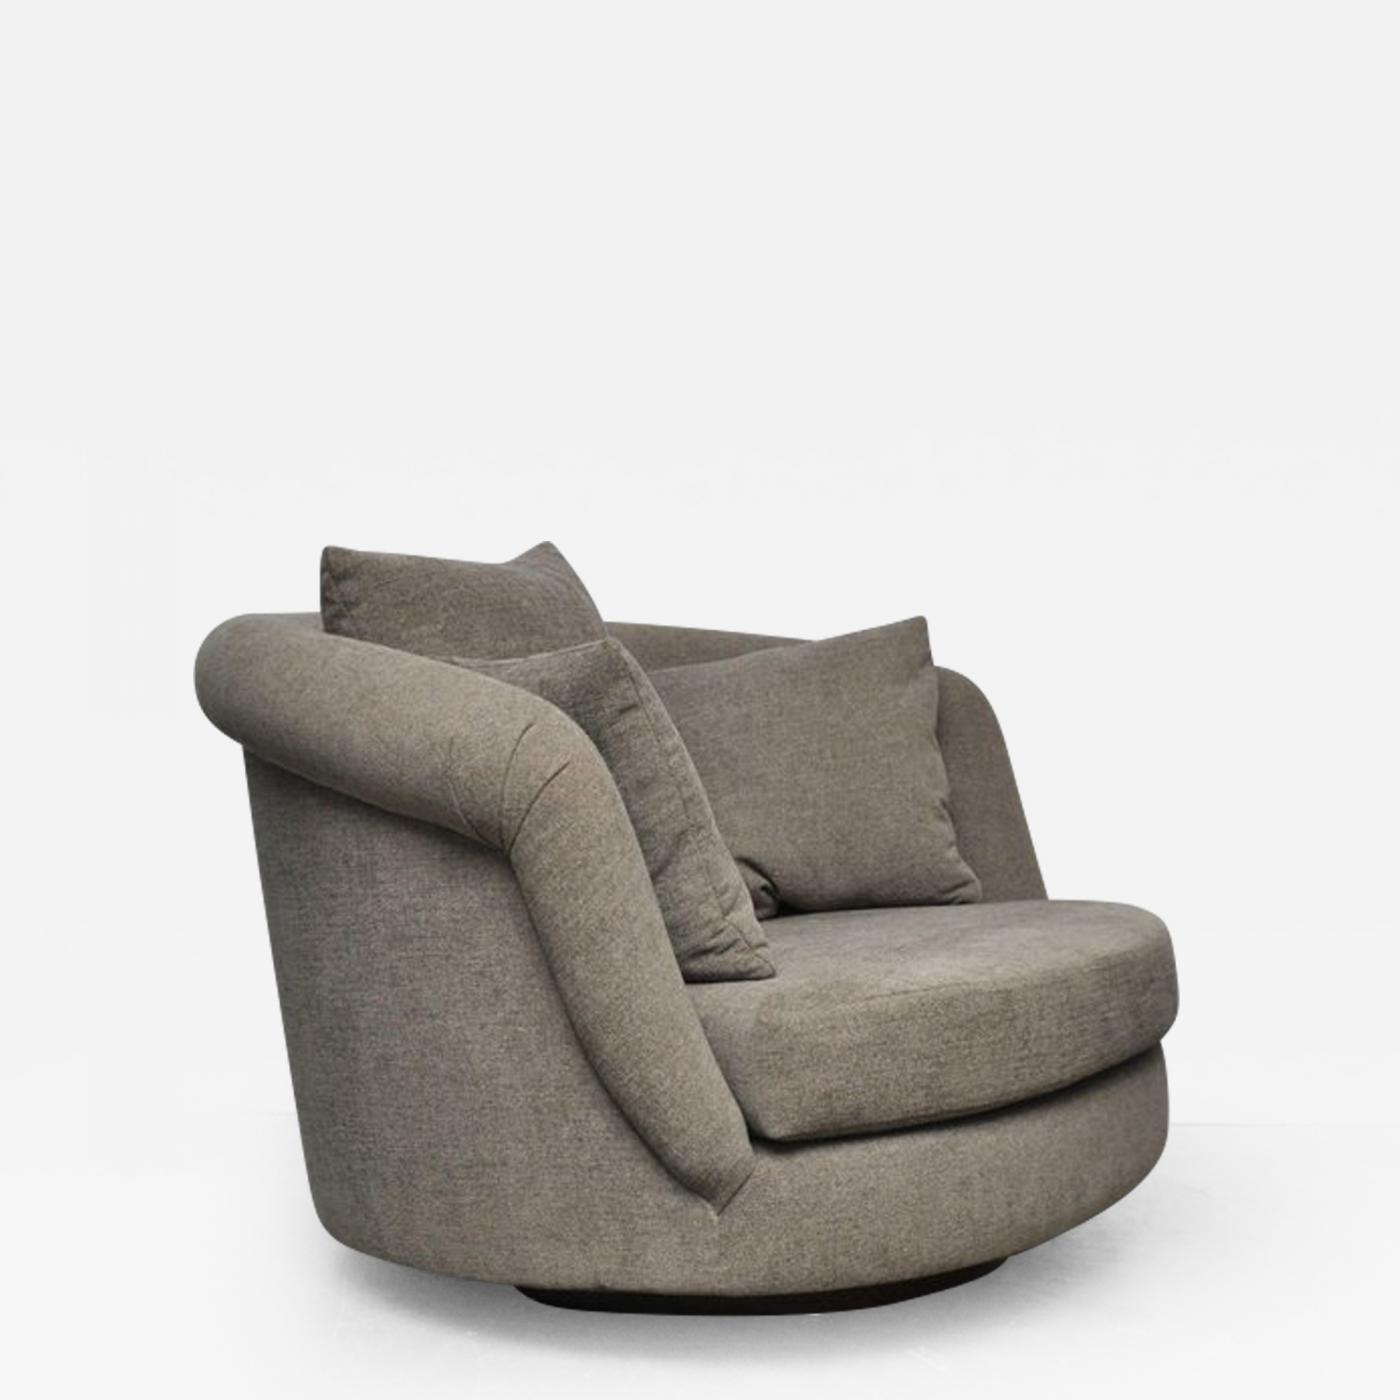 Listings / Furniture / Seating / Club Chairs · Milo Baughman Pair Of Large Milo  Baughman Swivel Chairs